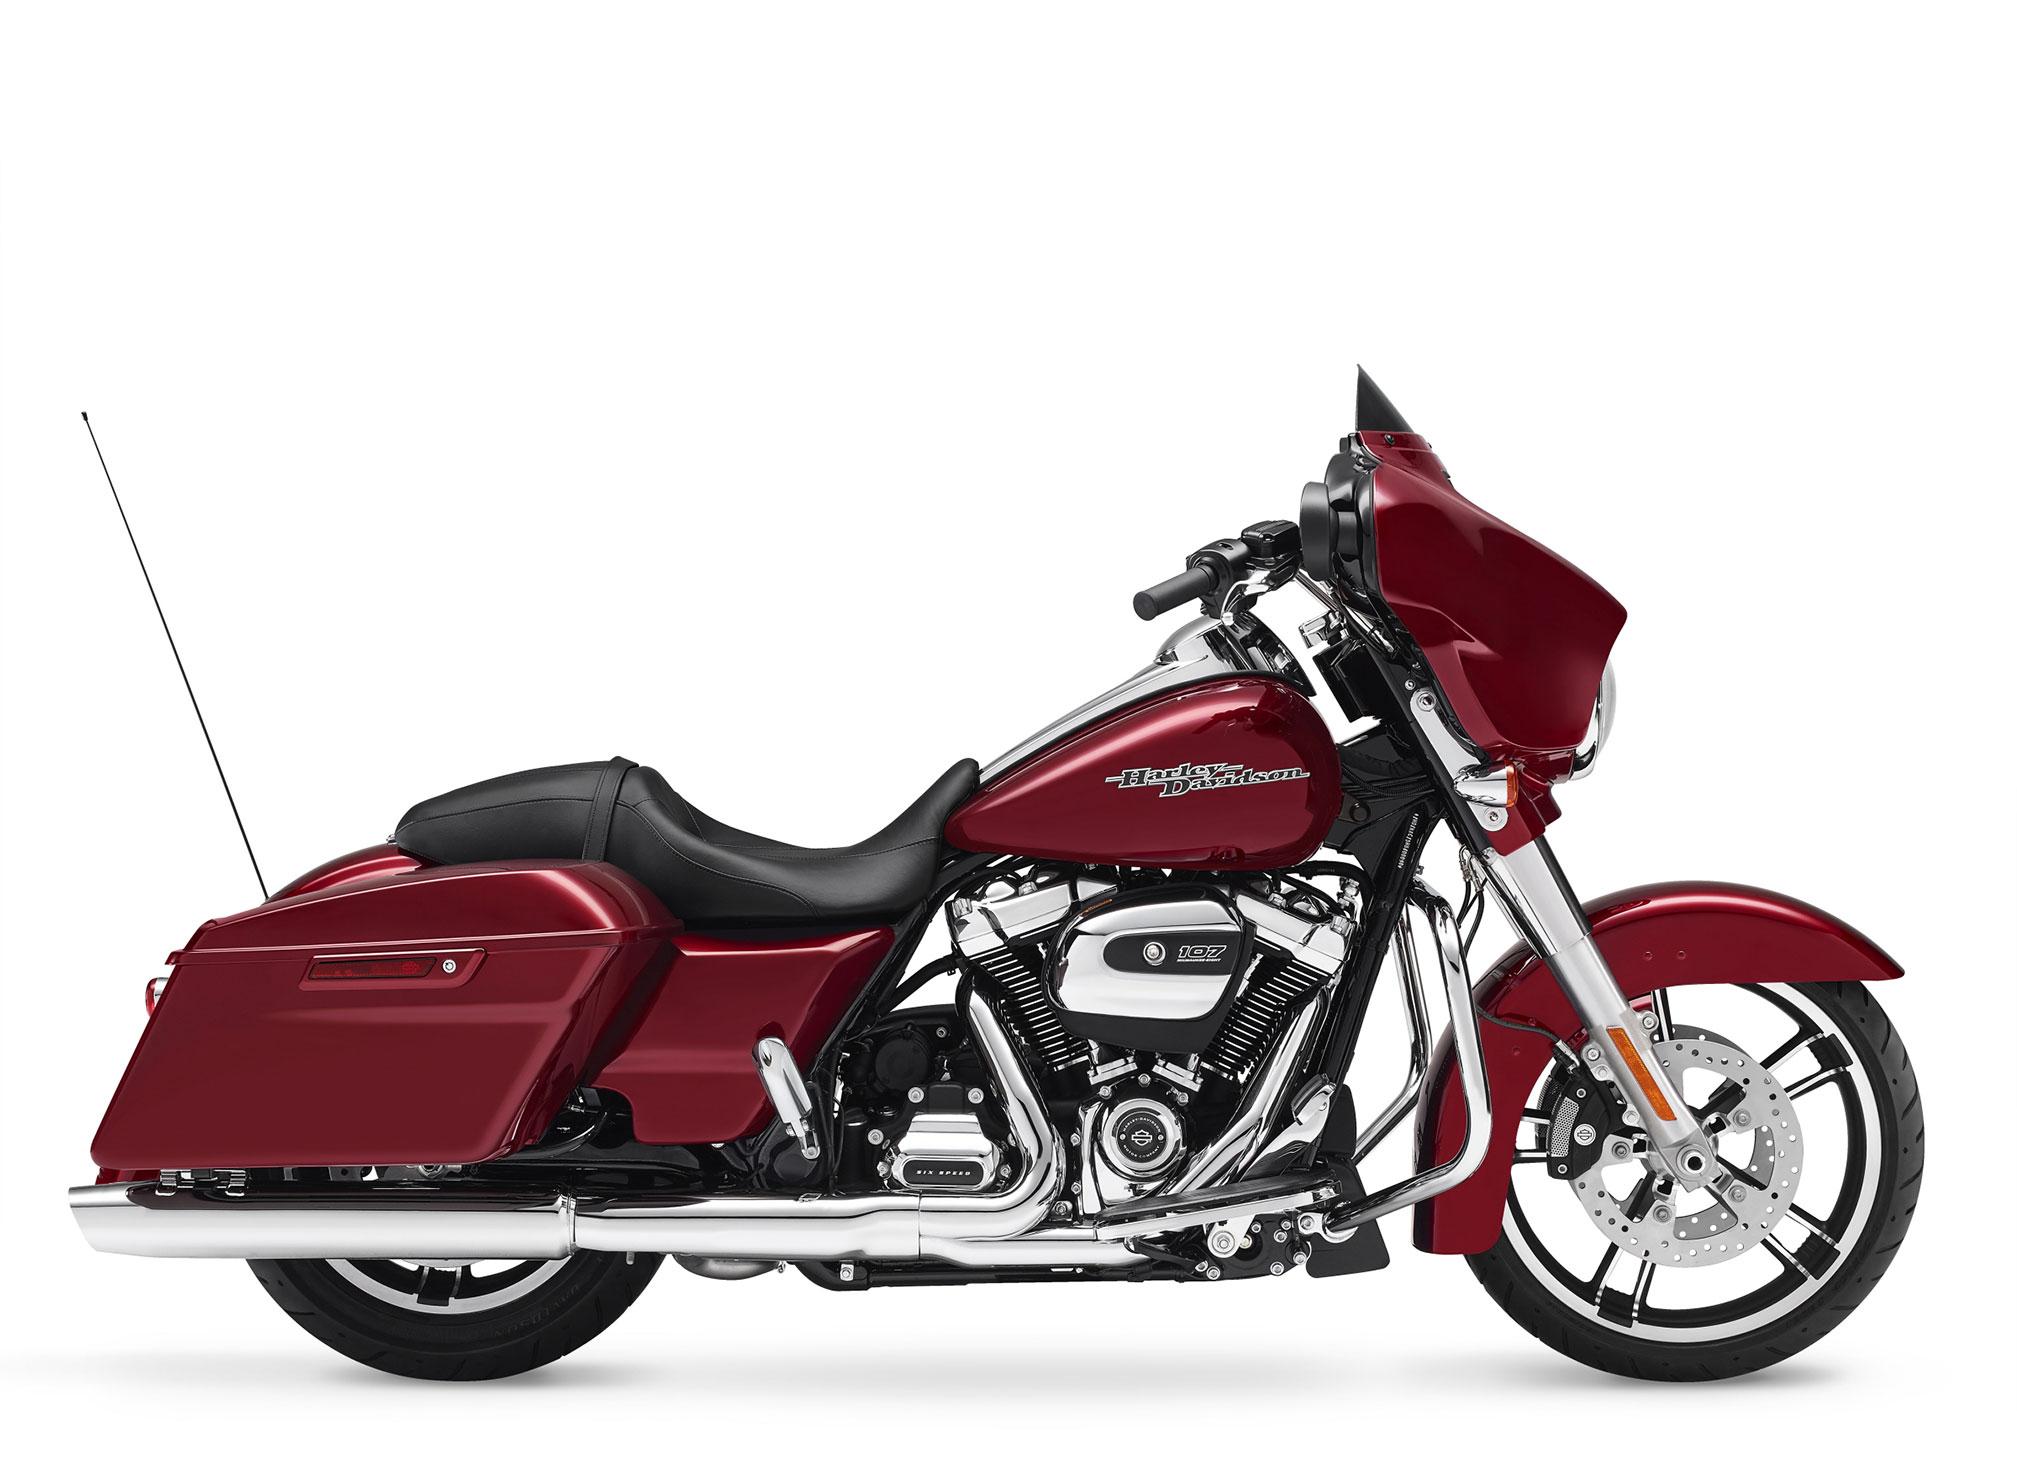 2017-Harley-Davidson-Street-Glide-Special4